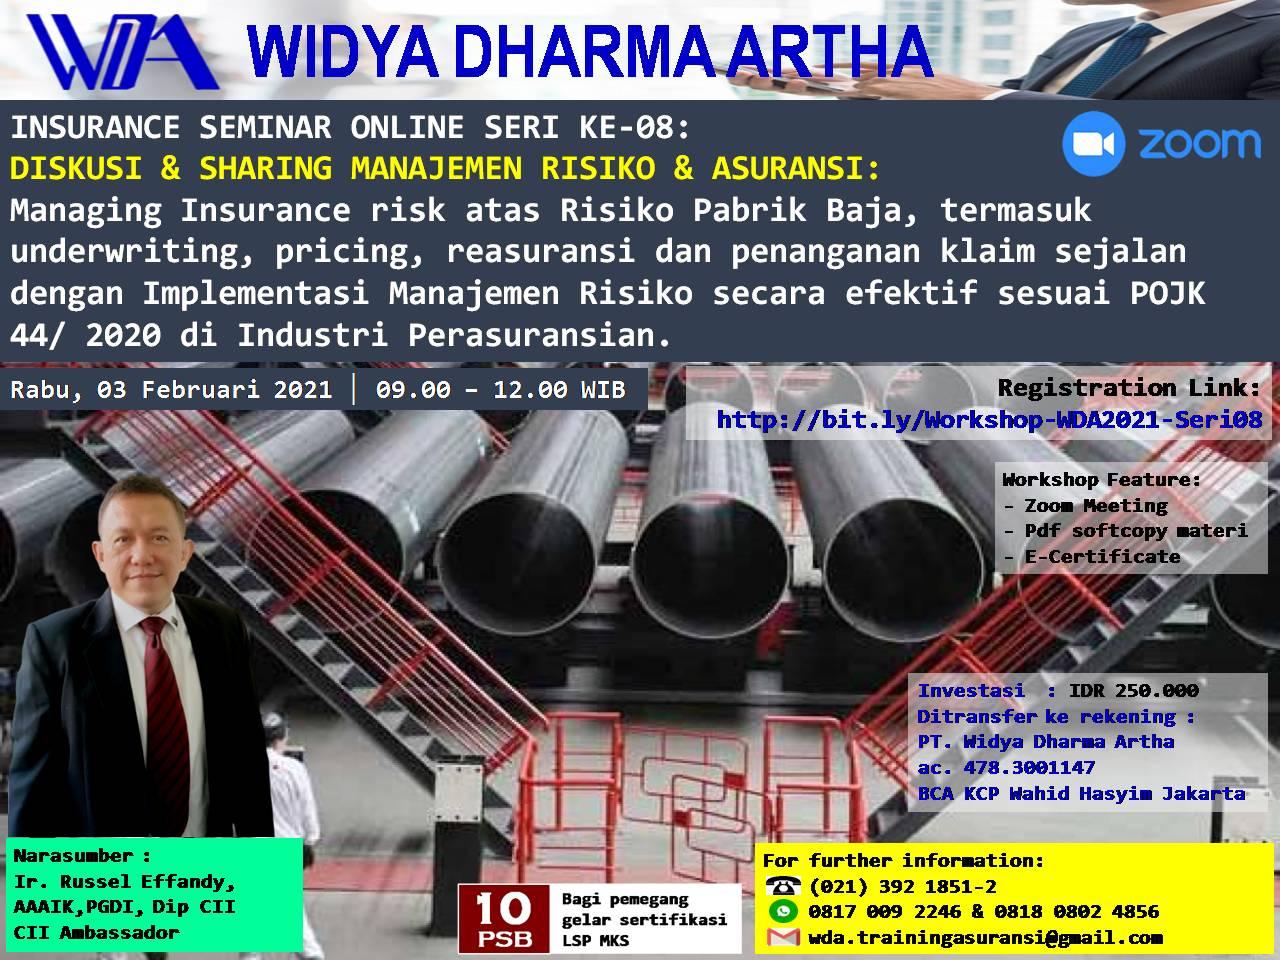 wda-pabrik-baja-030221